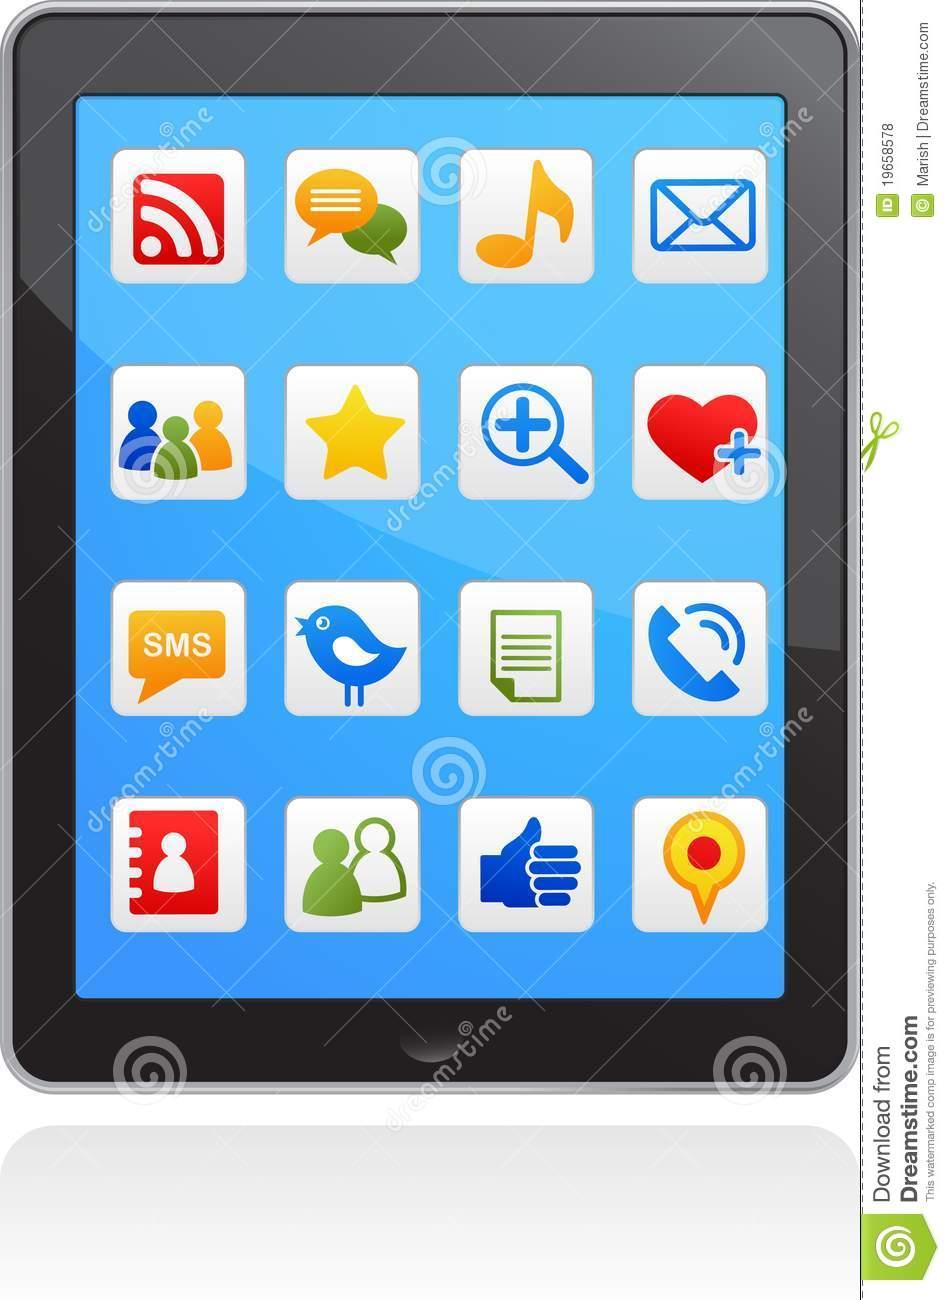 Social Media Icons Vector Free